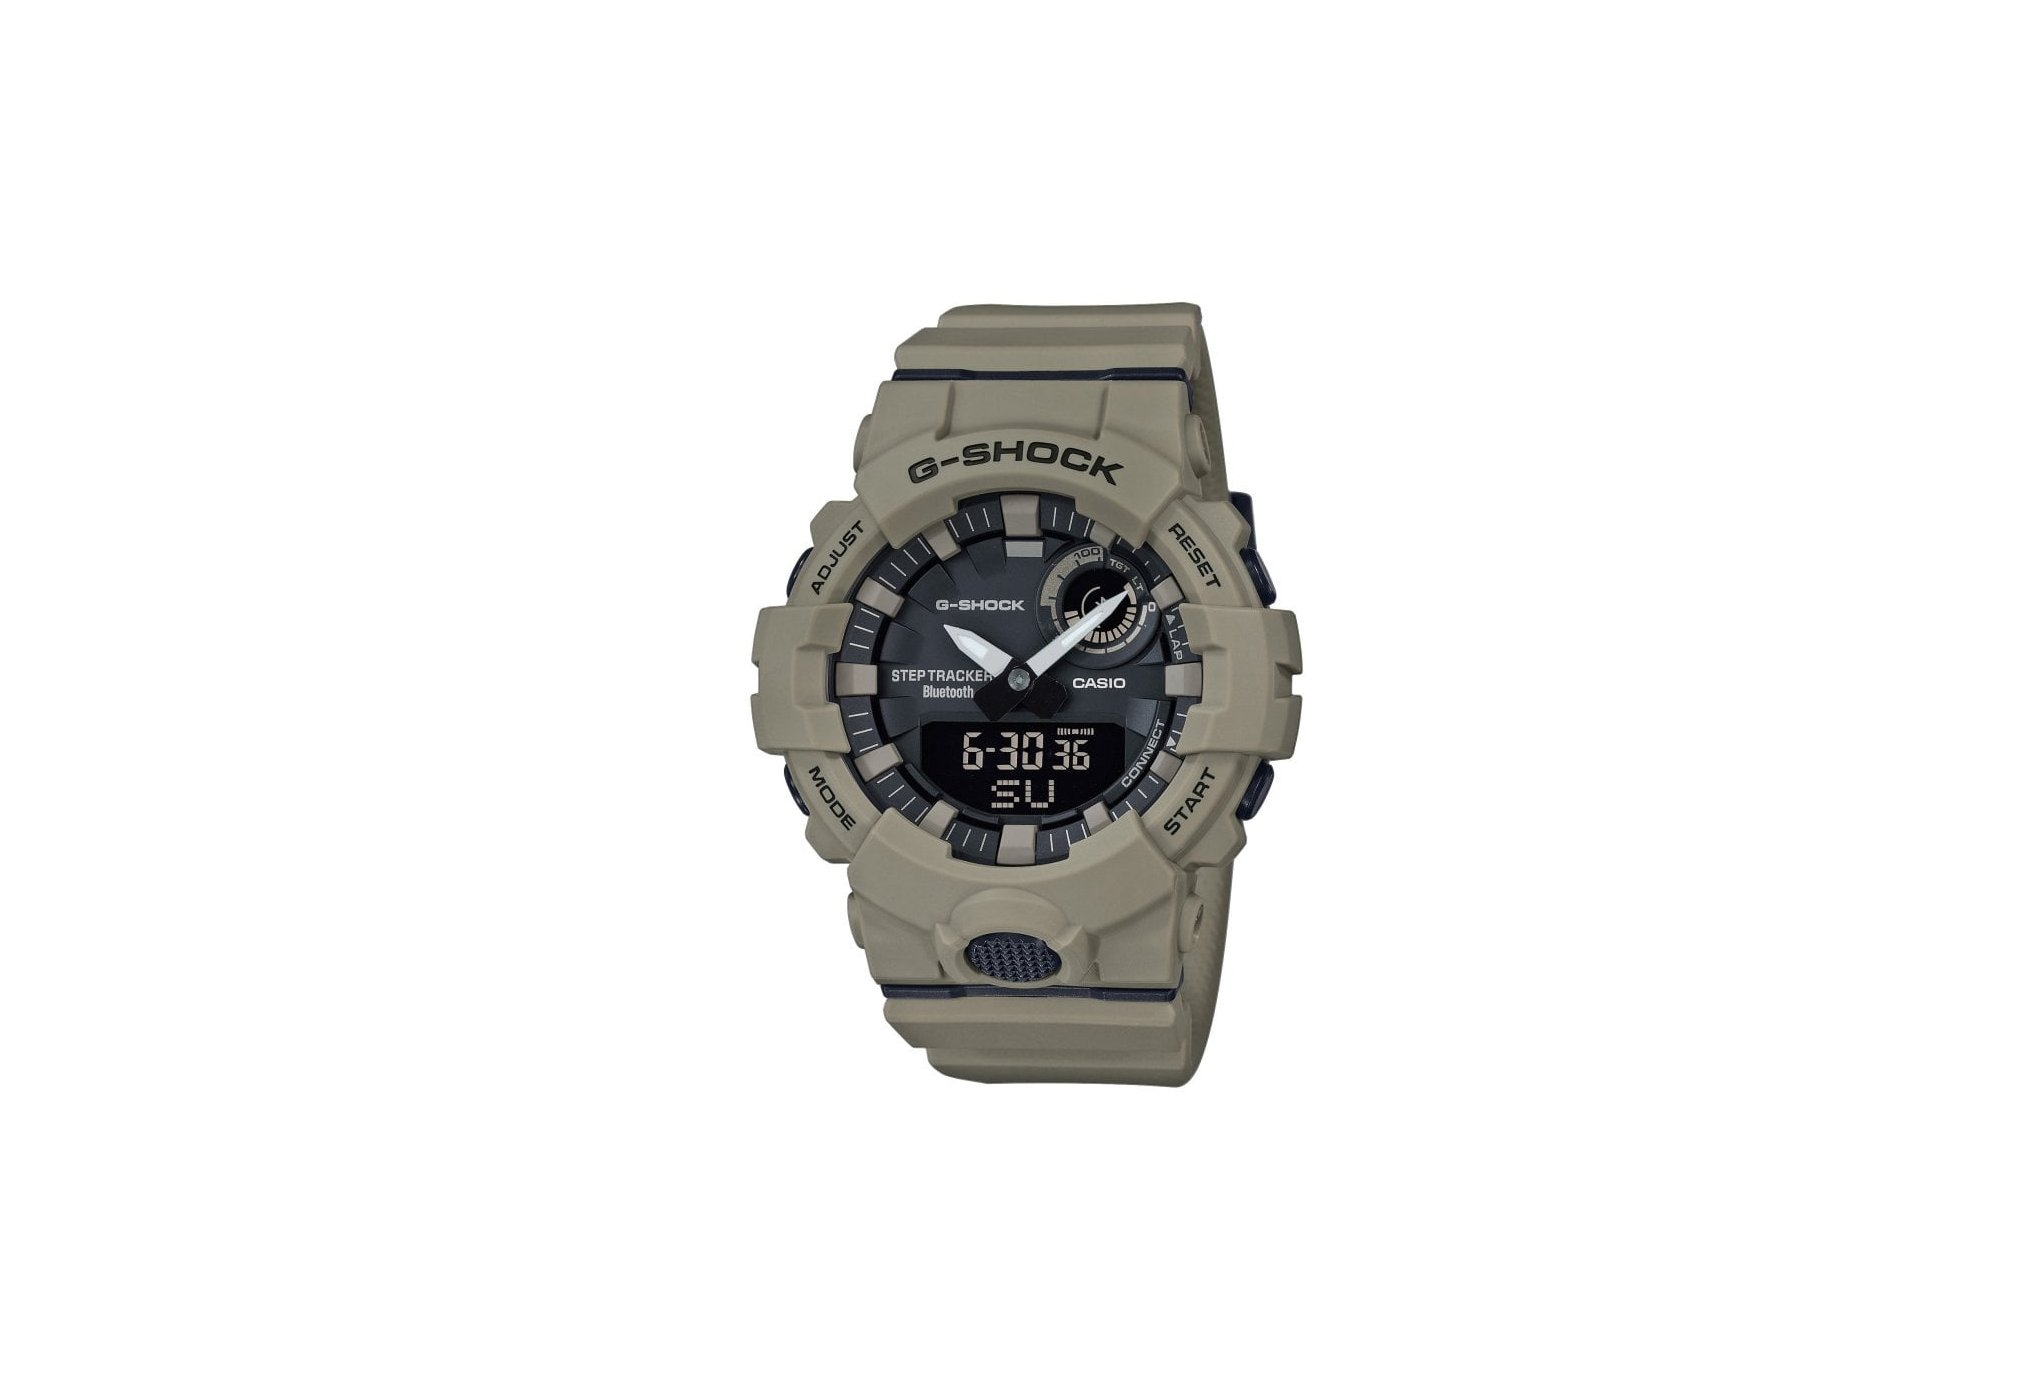 Casio G-Shock gba-800uc-5aer montres de sport